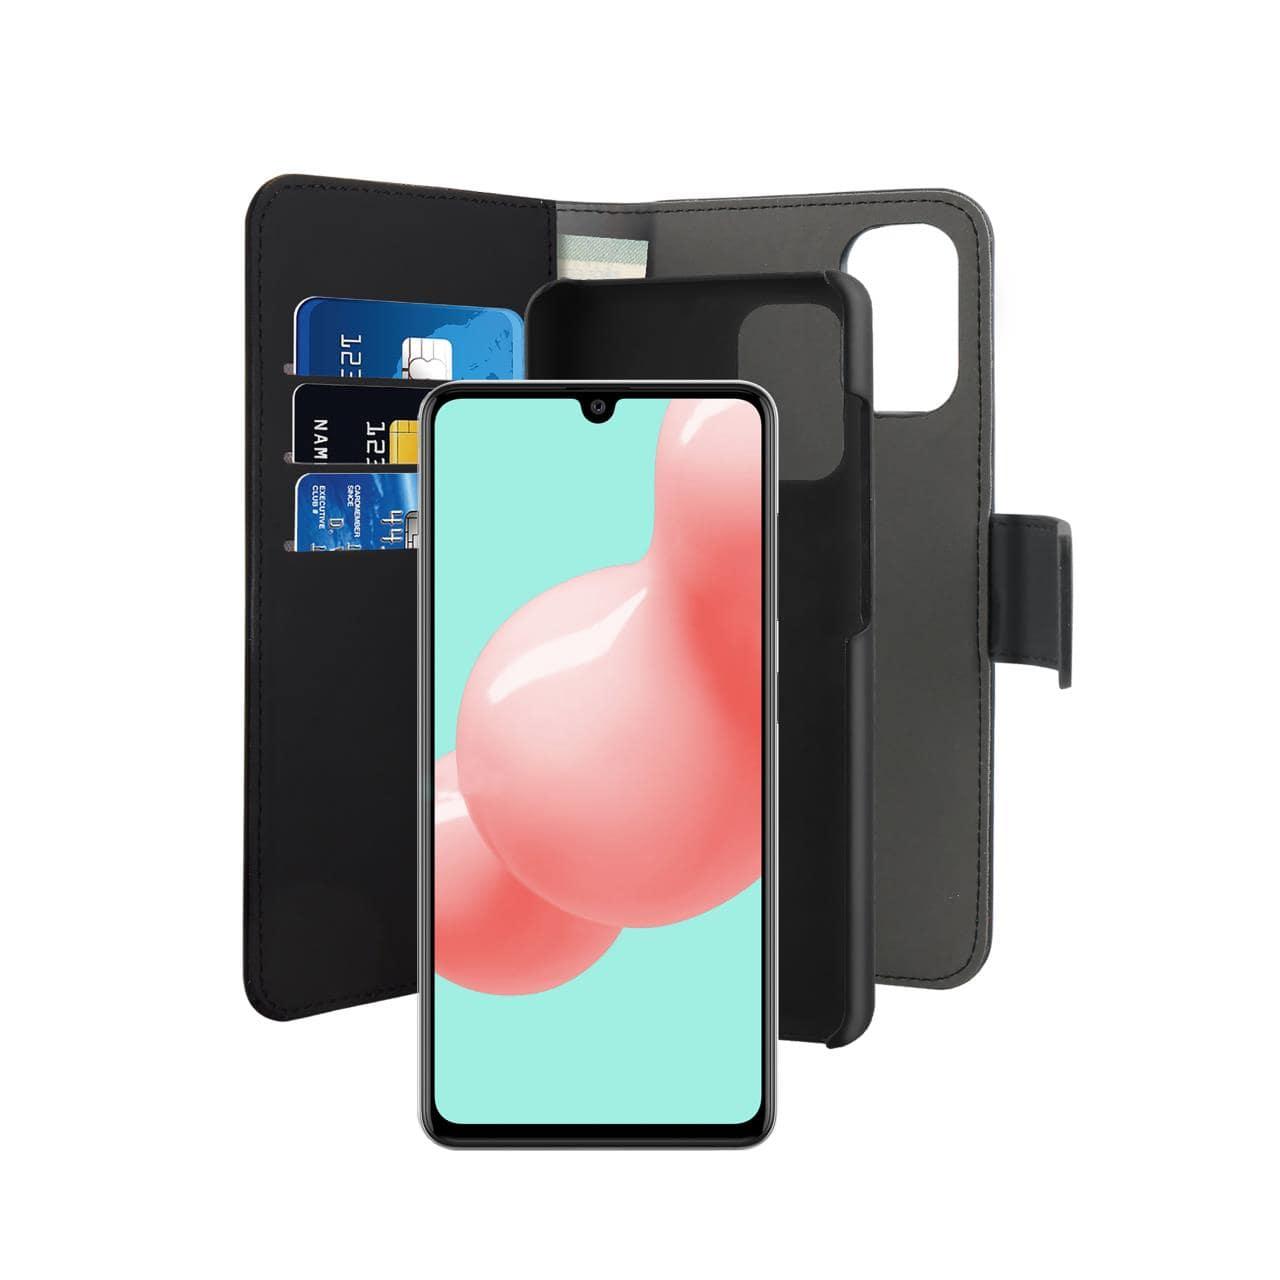 puro-custodia-wallet-detachable-samsung-galaxy-a41-nera_01-min